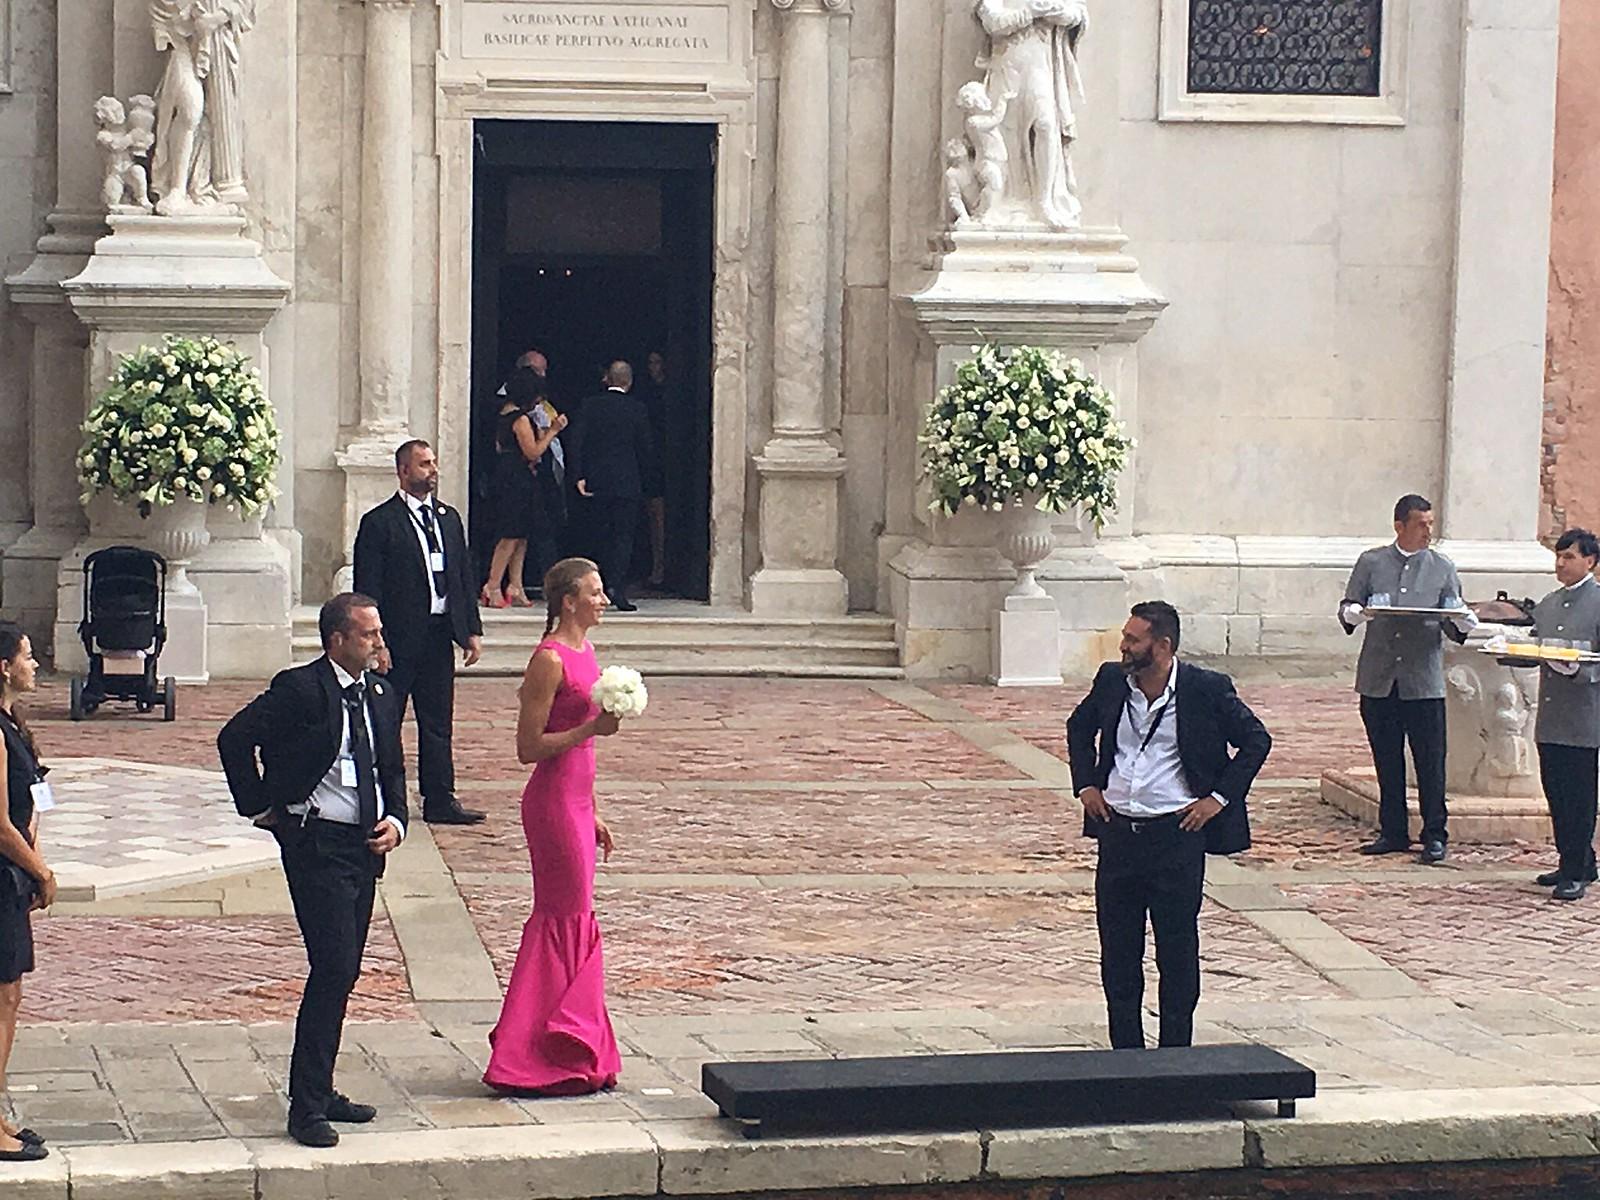 Weddings of Ana Ivanovic and Bastian Schweinsteiger